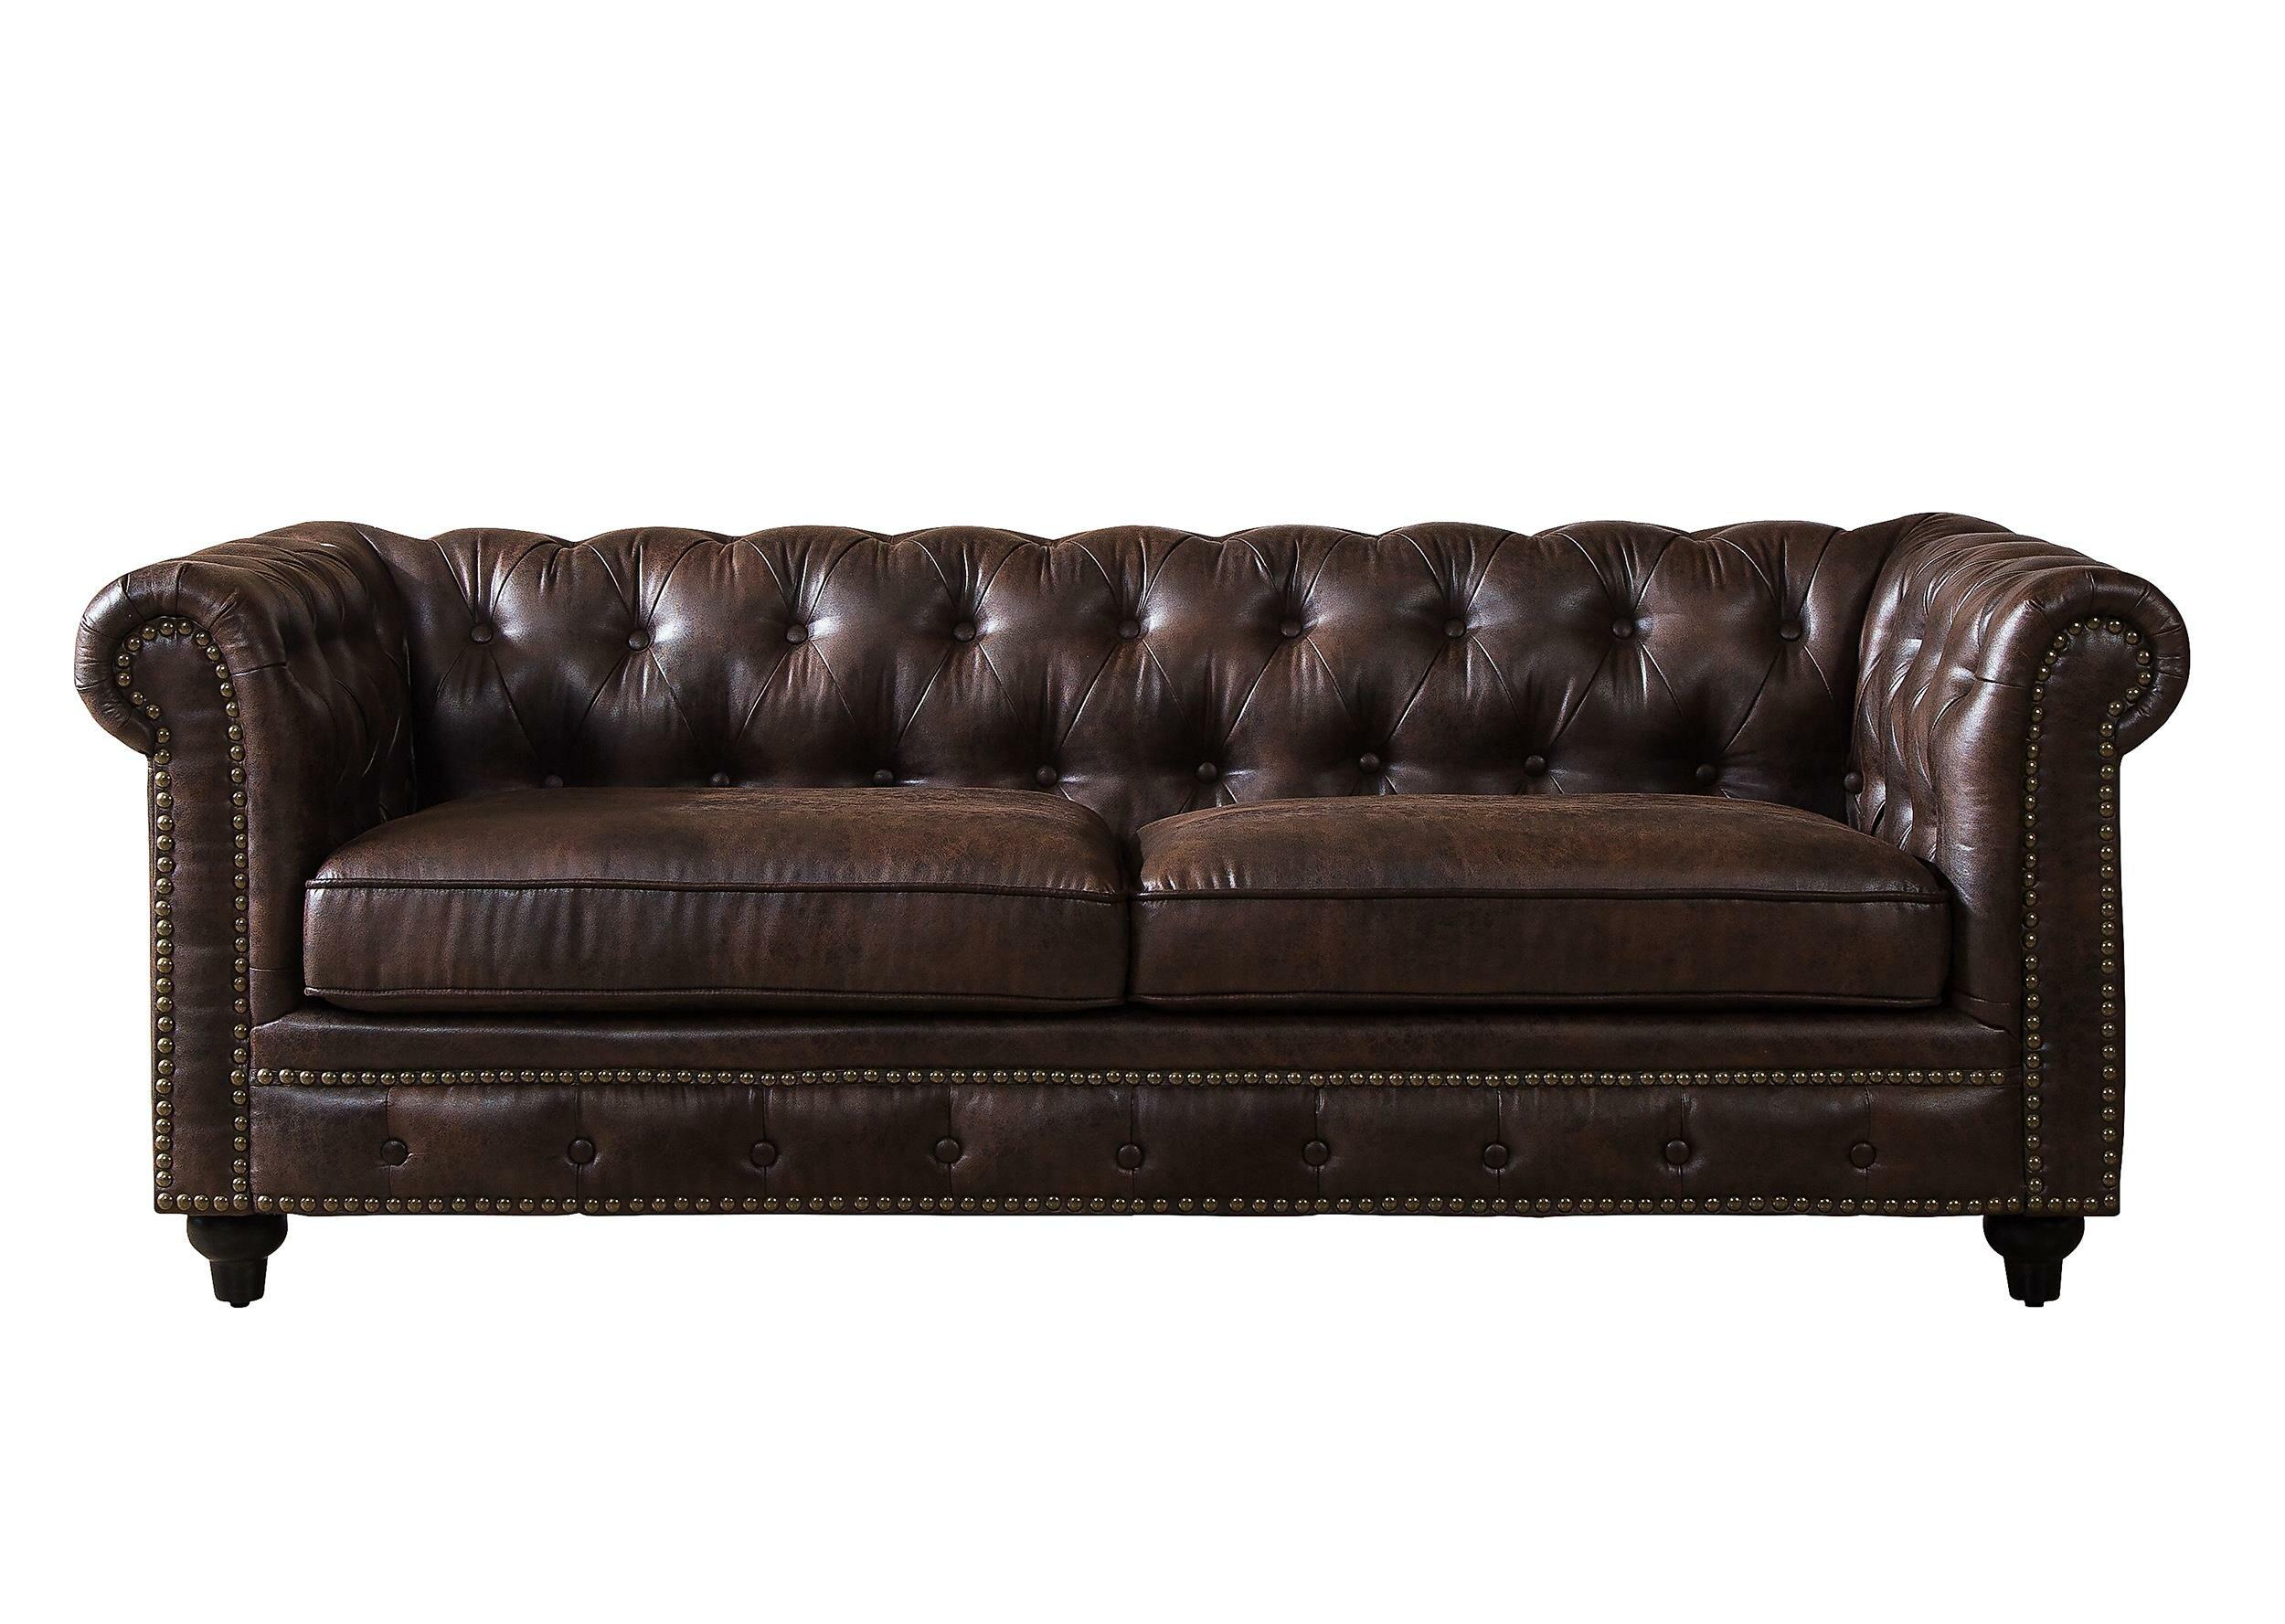 Merveilleux Mangano Tufted Chesterfield Sofa